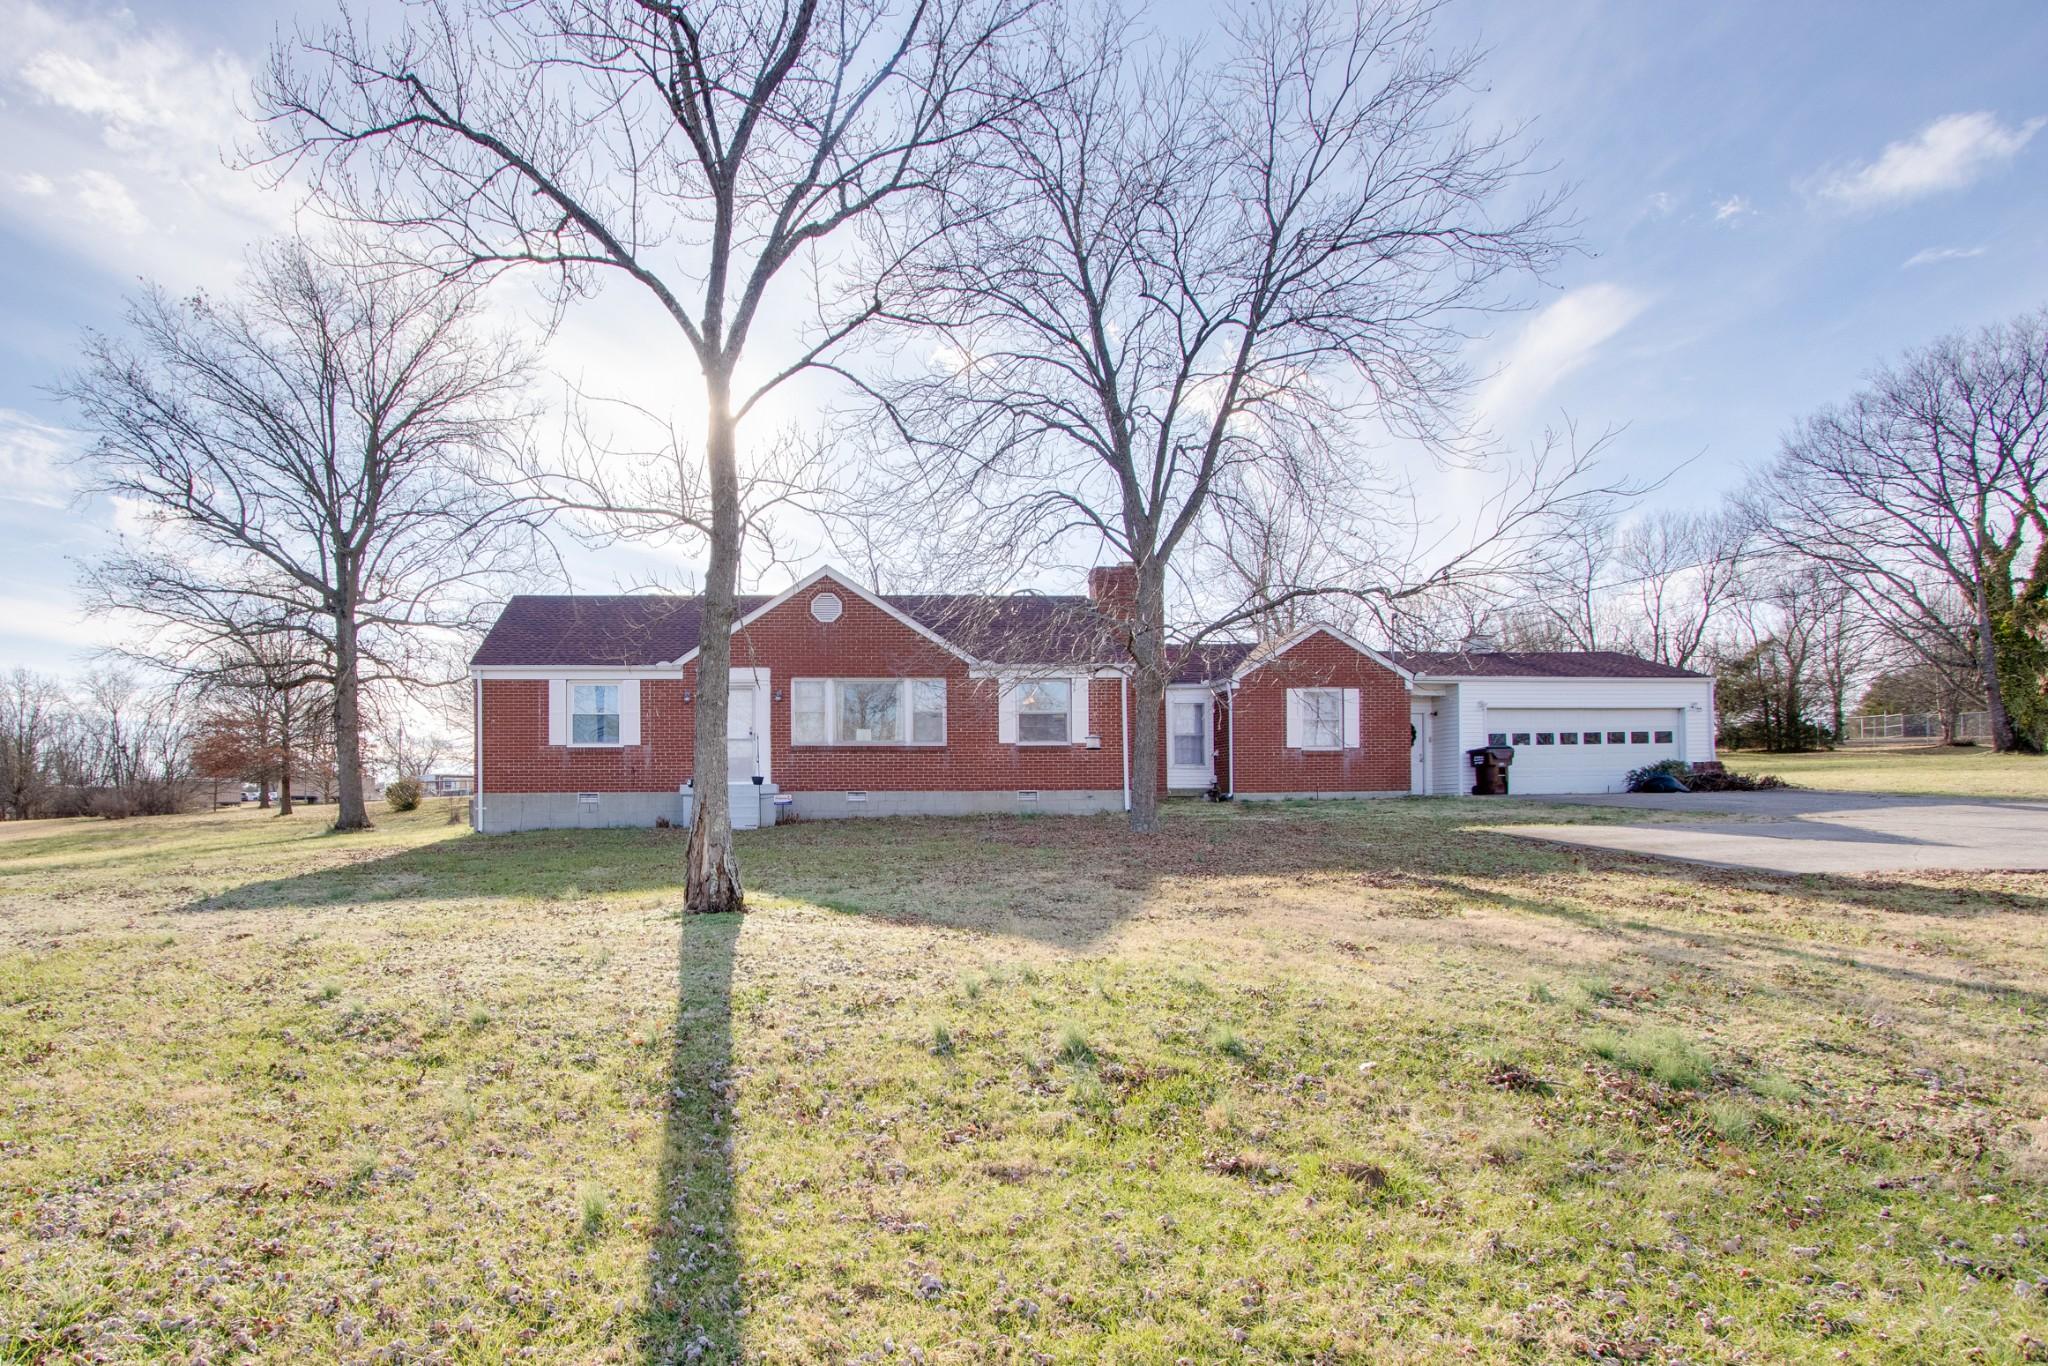 1195 Old Hickory Blvd, Nashville, TN 37207 - Nashville, TN real estate listing